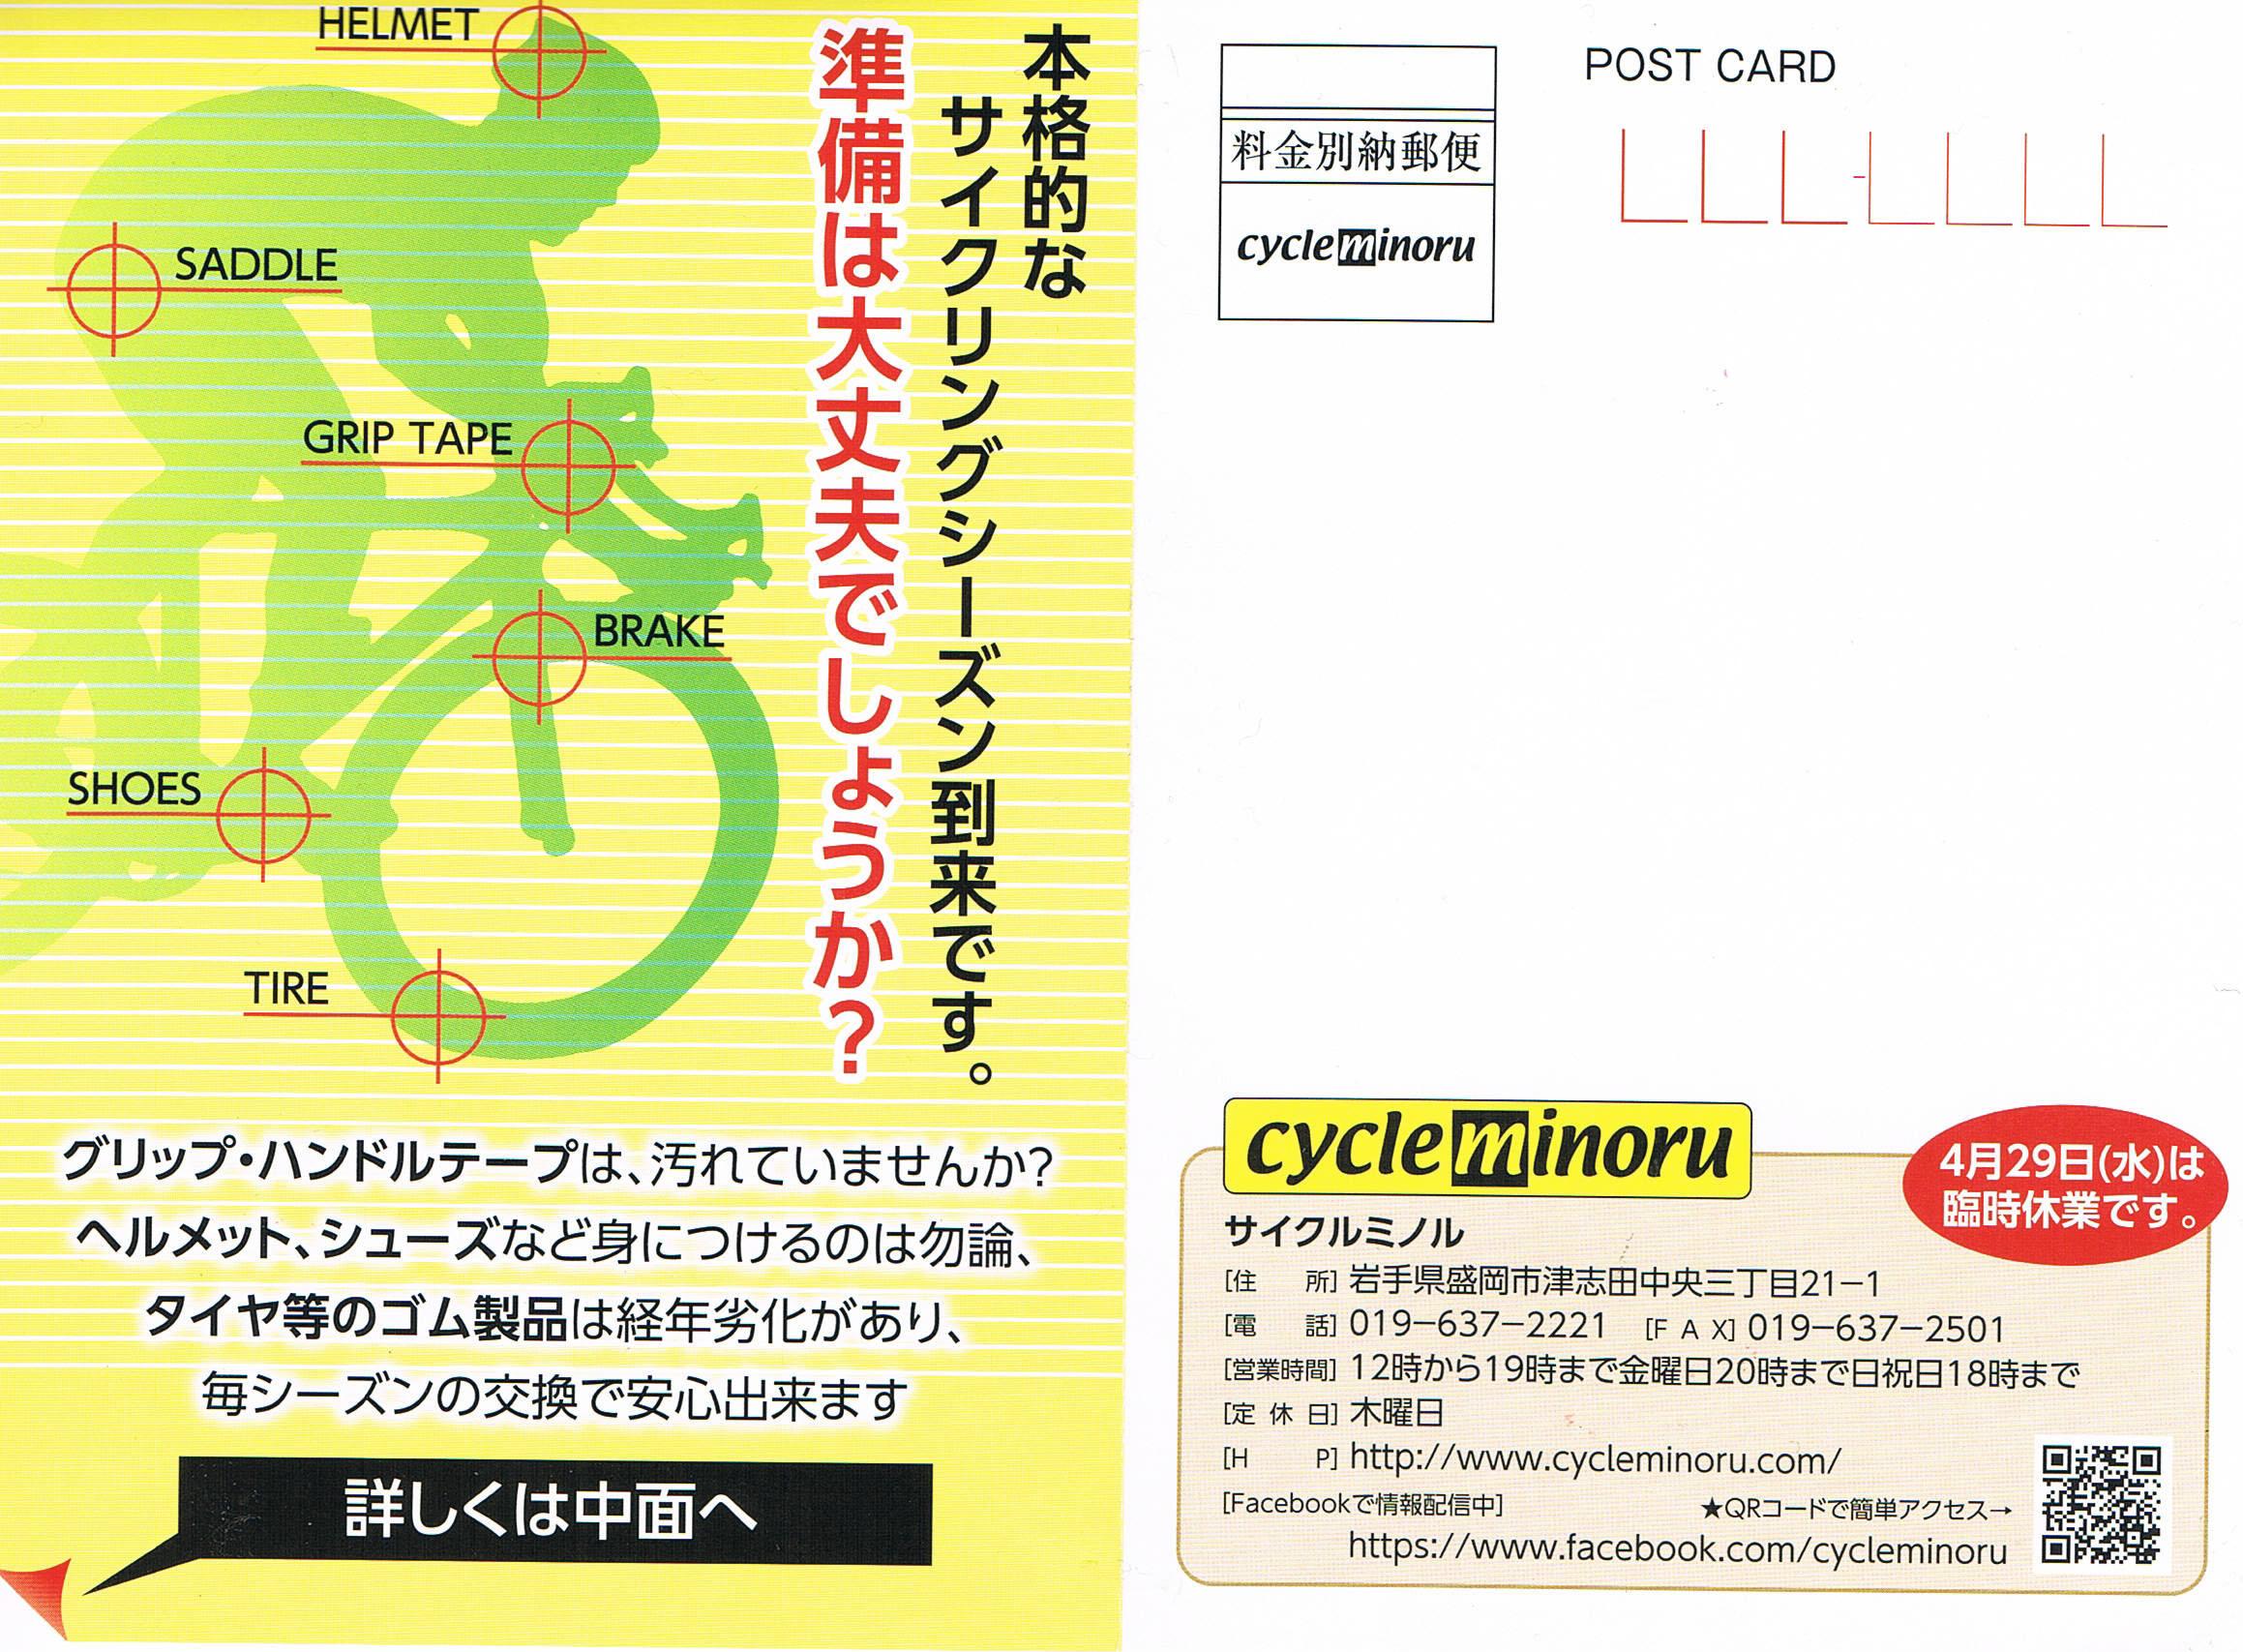 CCF20150424_00001.jpg